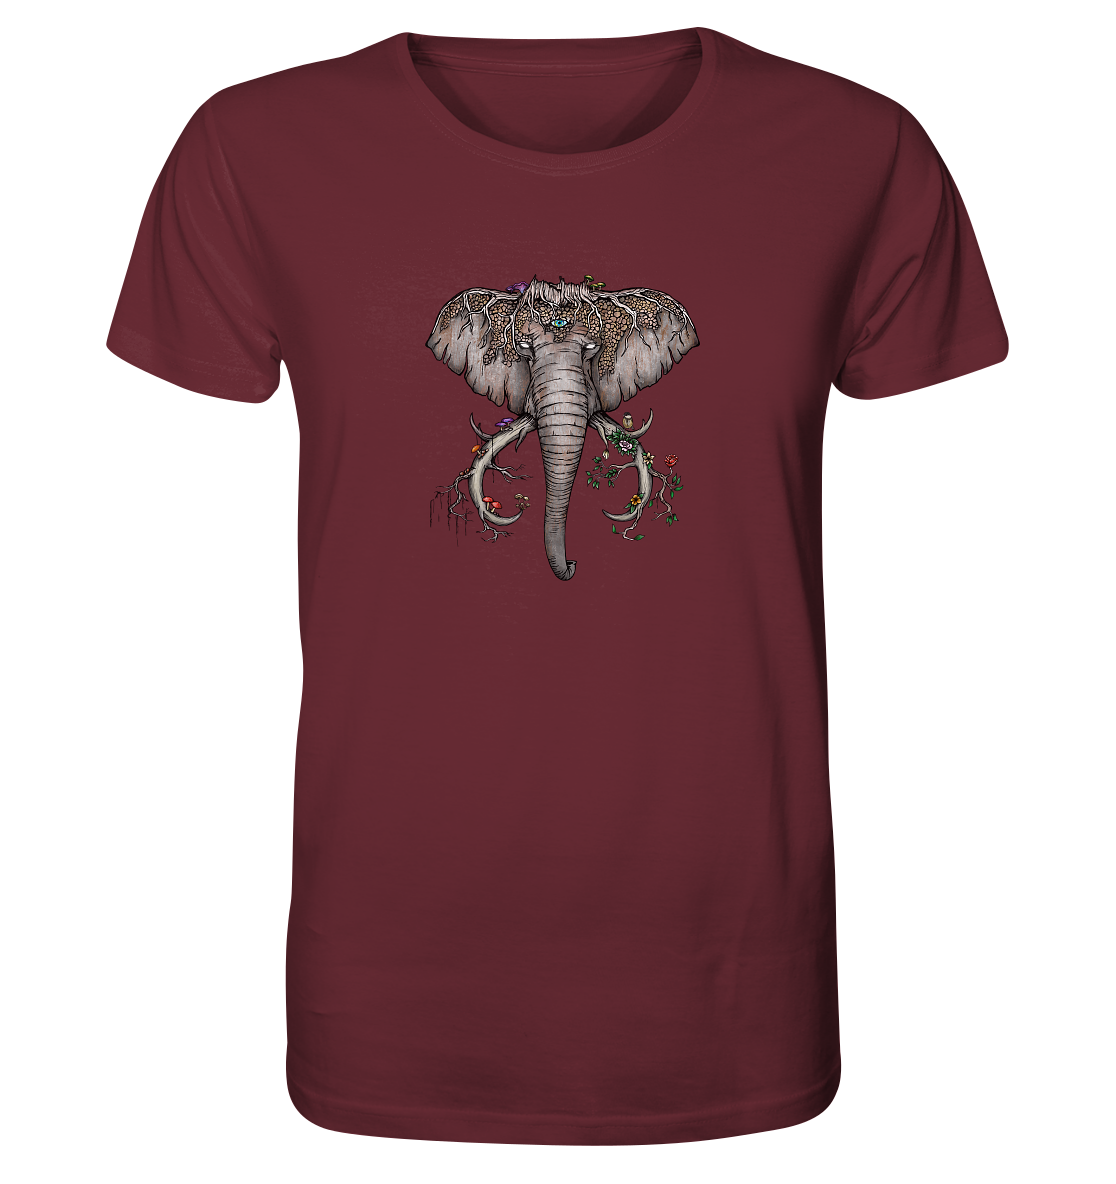 front-organic-shirt-672b34-1116x-2.png